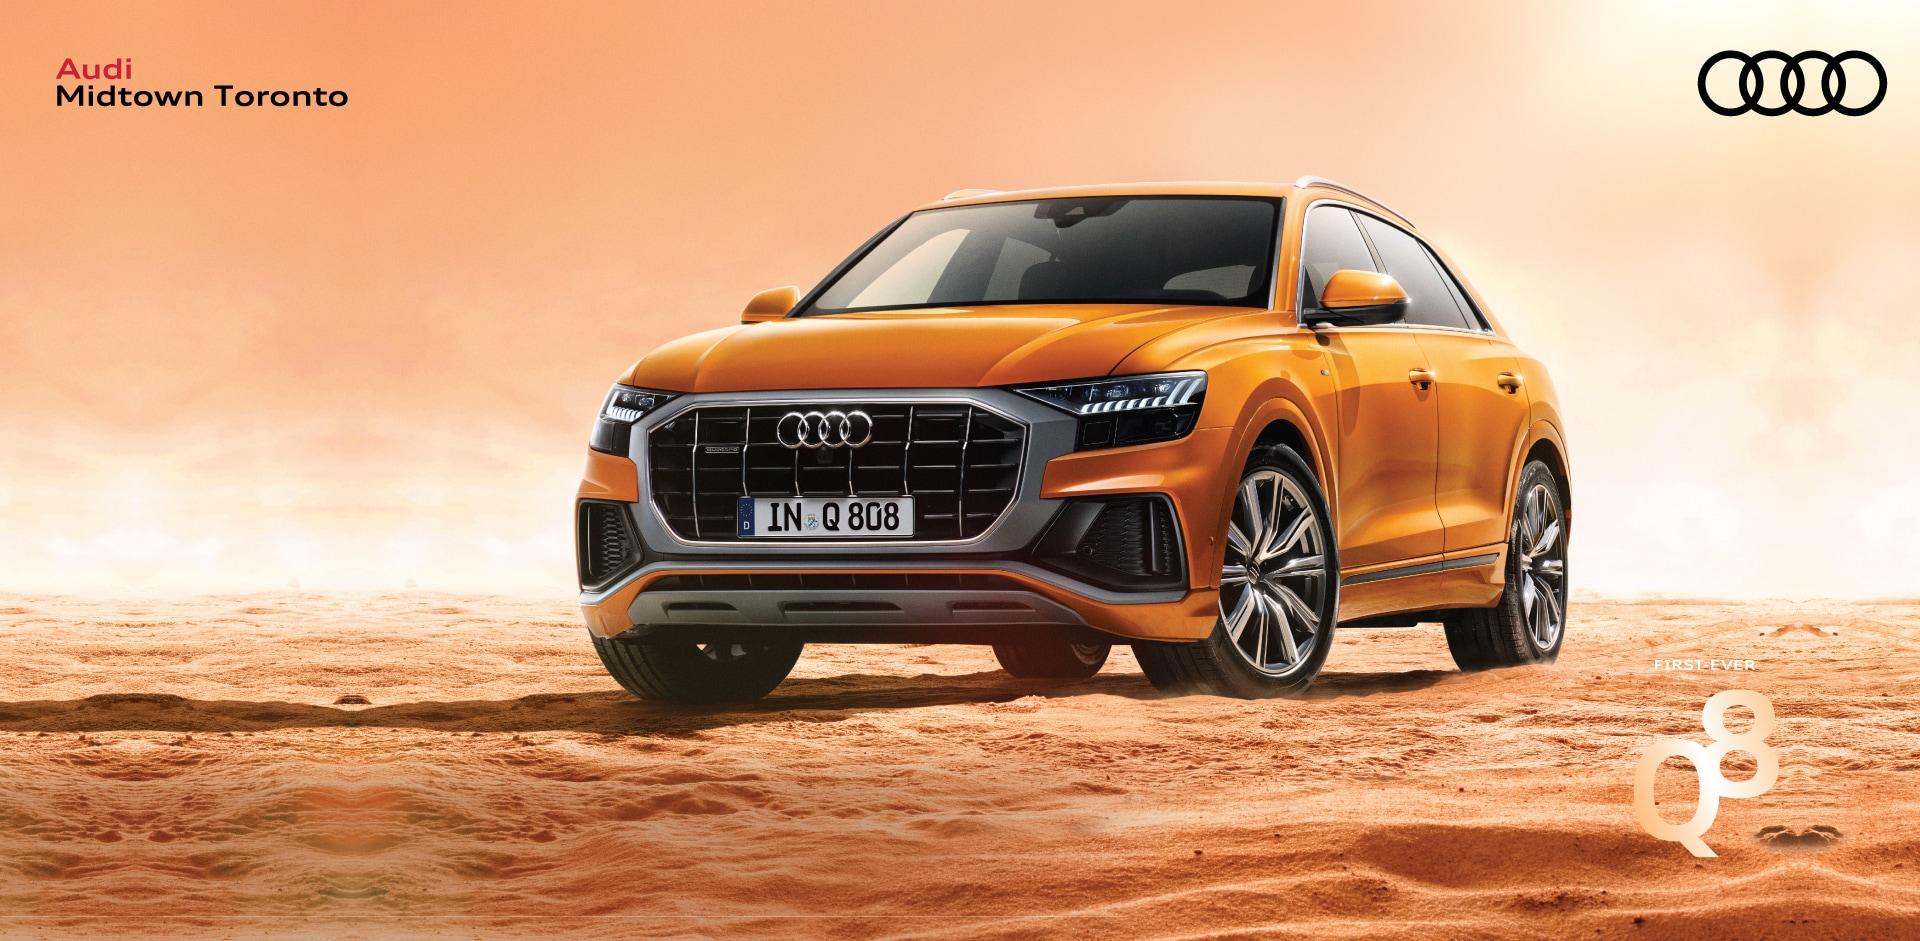 Whats New With Audi In Toronto Audi Midtown Toronto